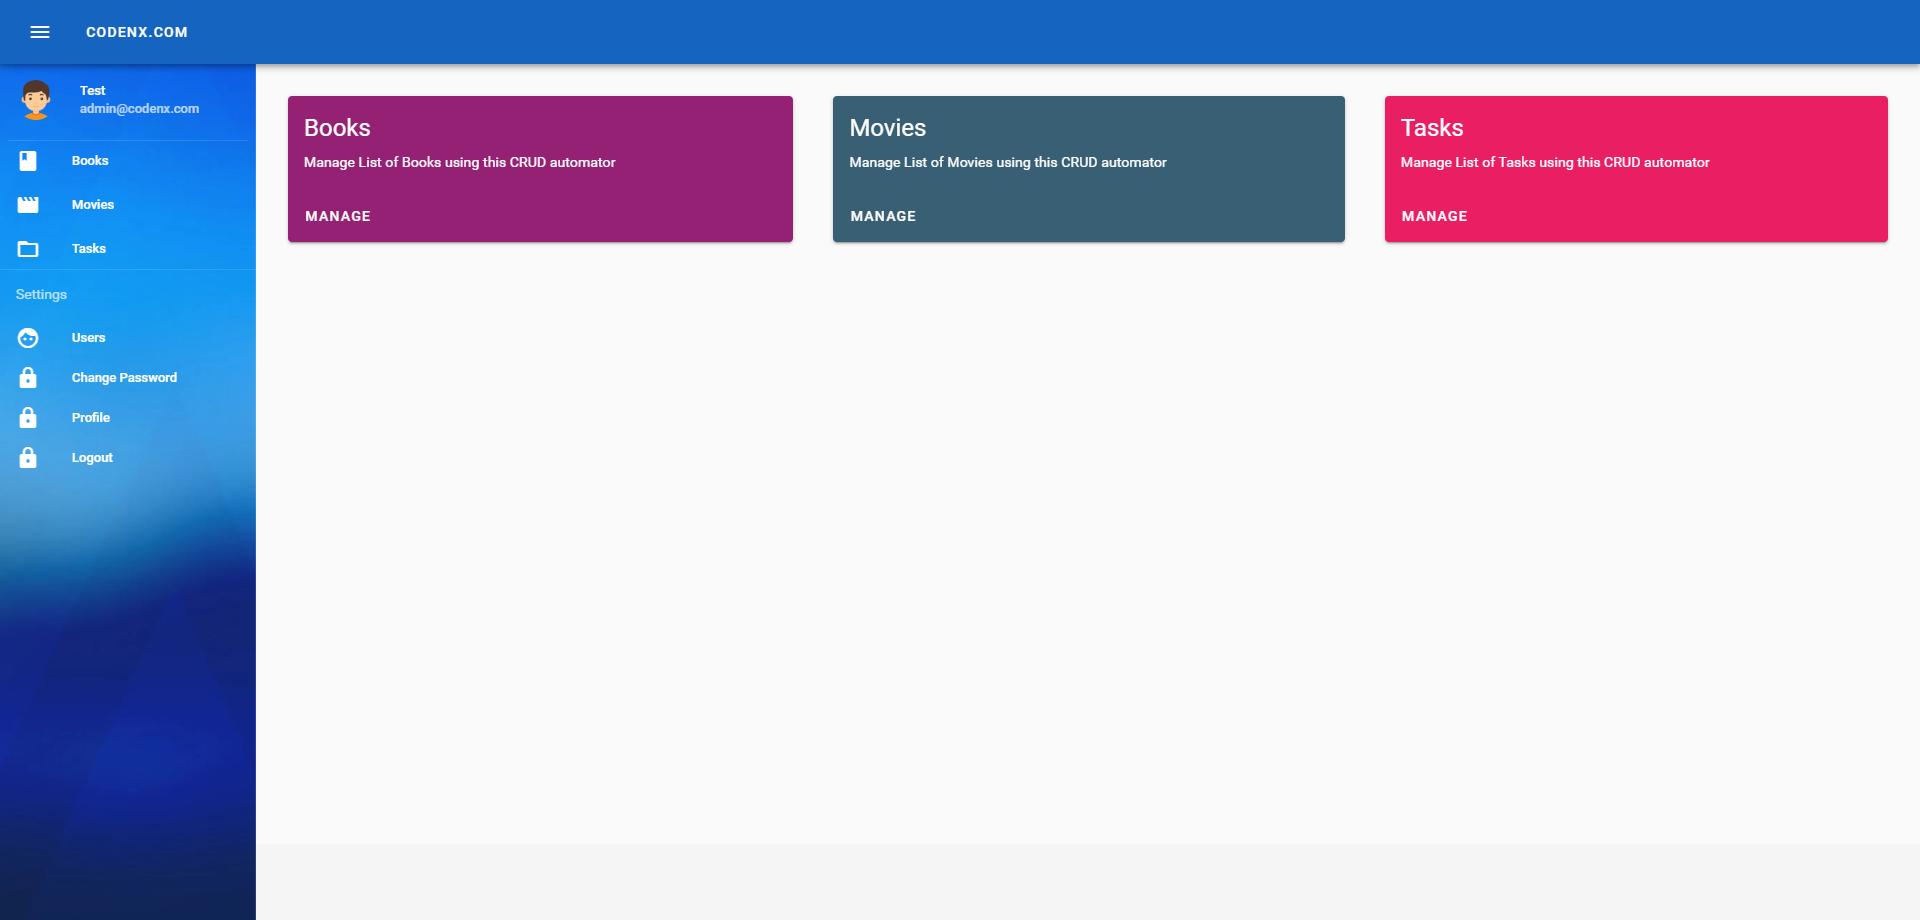 Vue Fullstack Automation - Database CRUD Generator using VueJS, NodeJS,  MongoDB